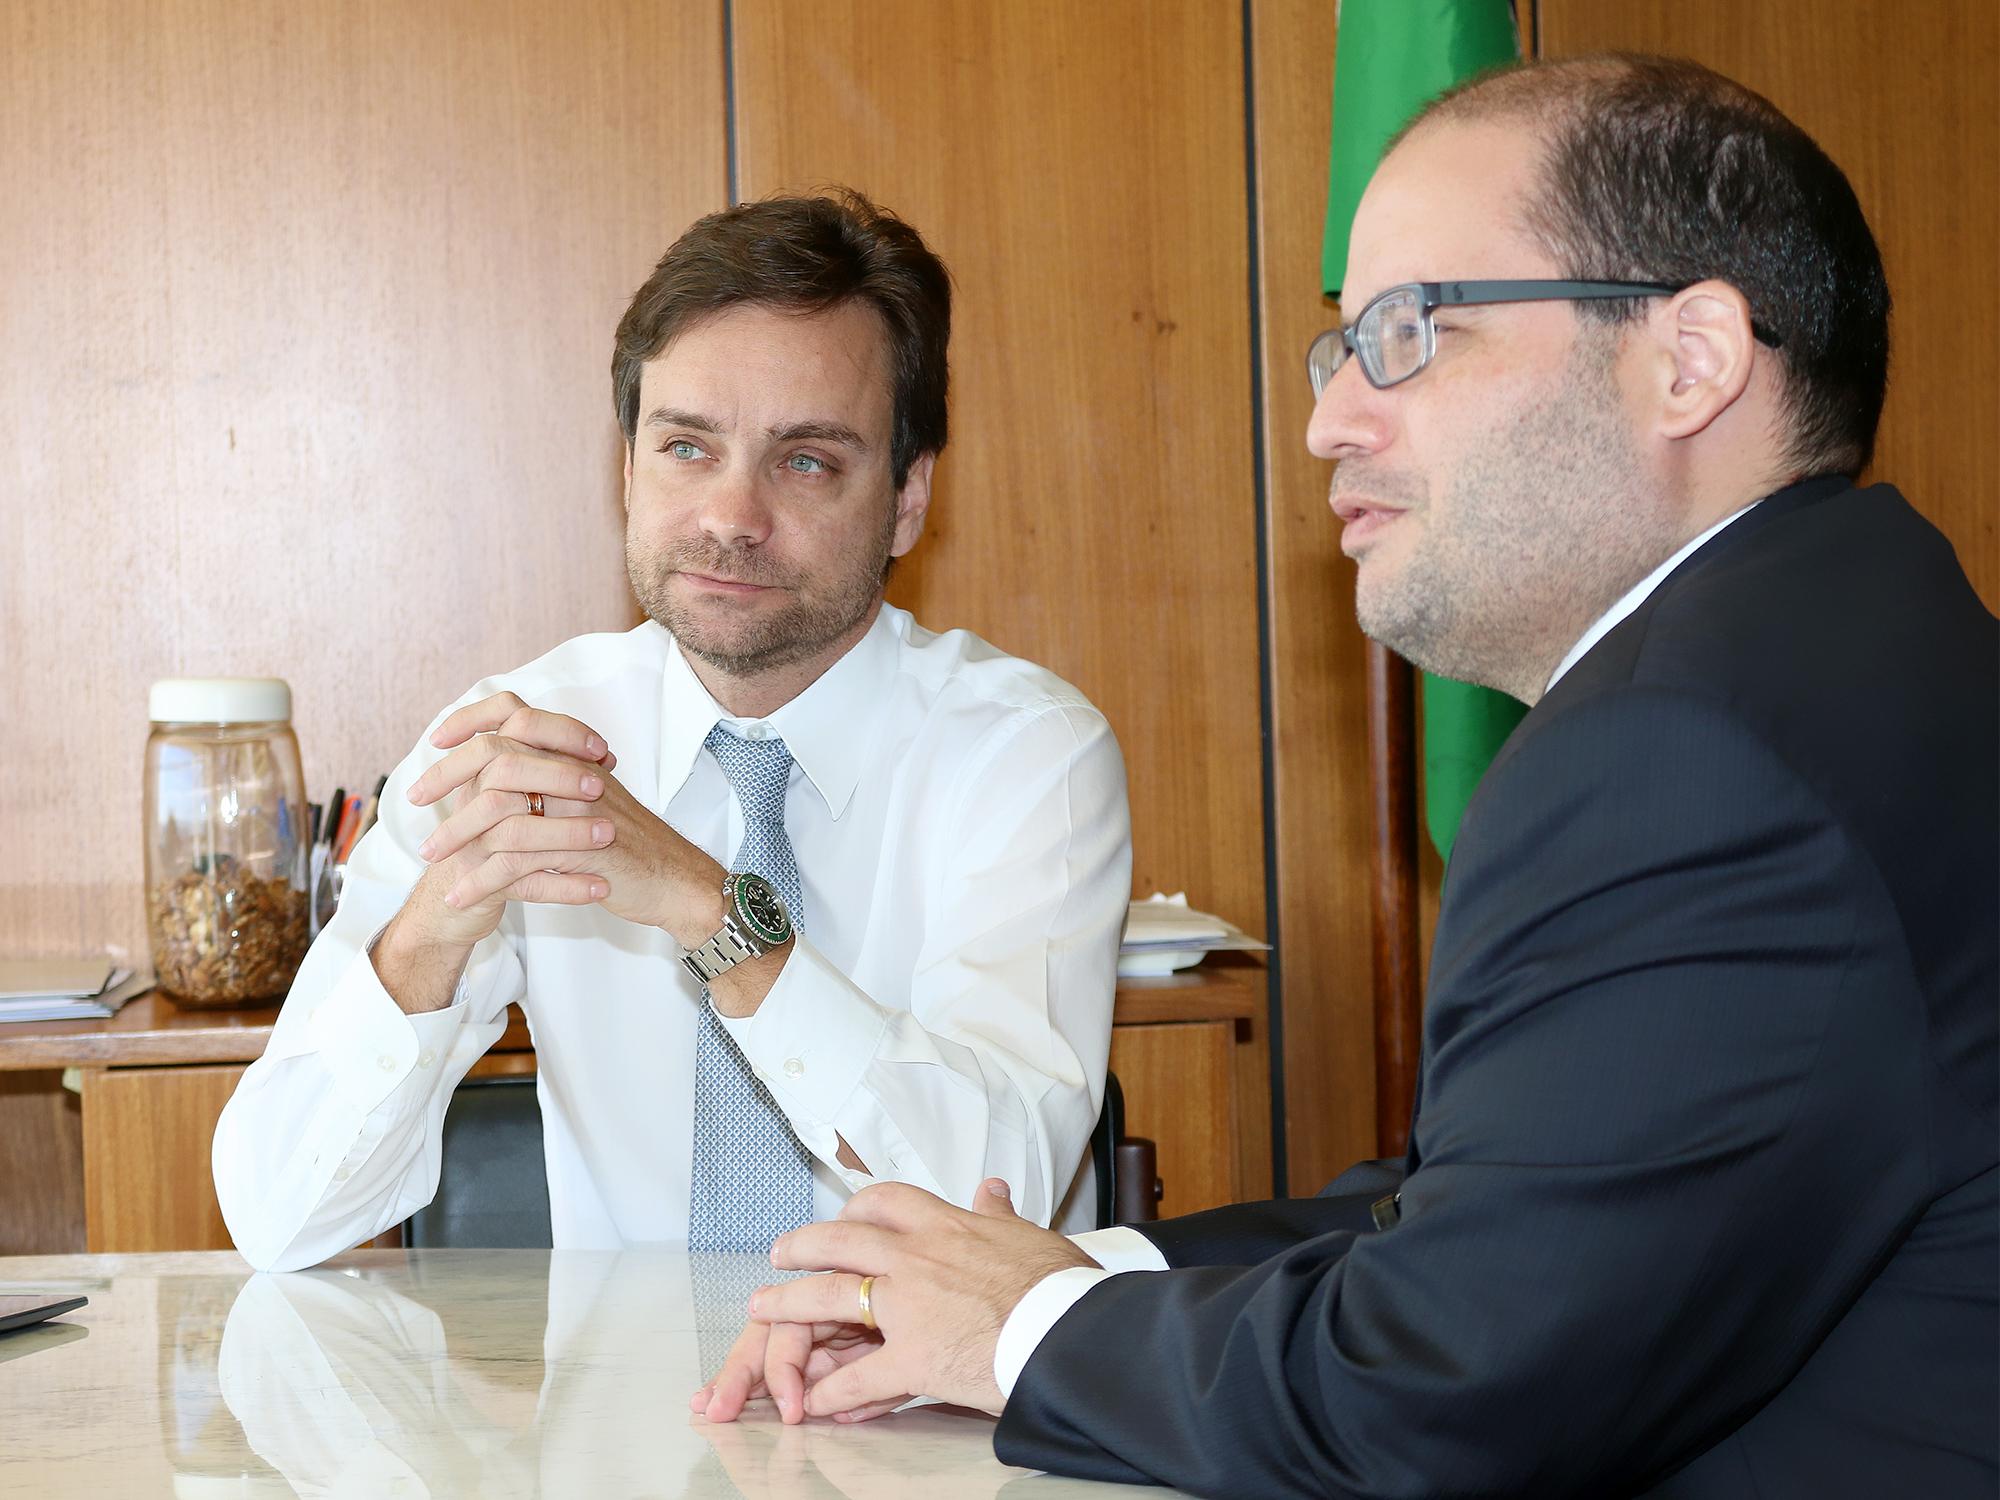 Subchefe para Assuntos Jurídicos da Casa Civil, Gustavo do Vale Rocha e o Subchefe Adjunto Felipe Cascaes Sabino Bresciani.